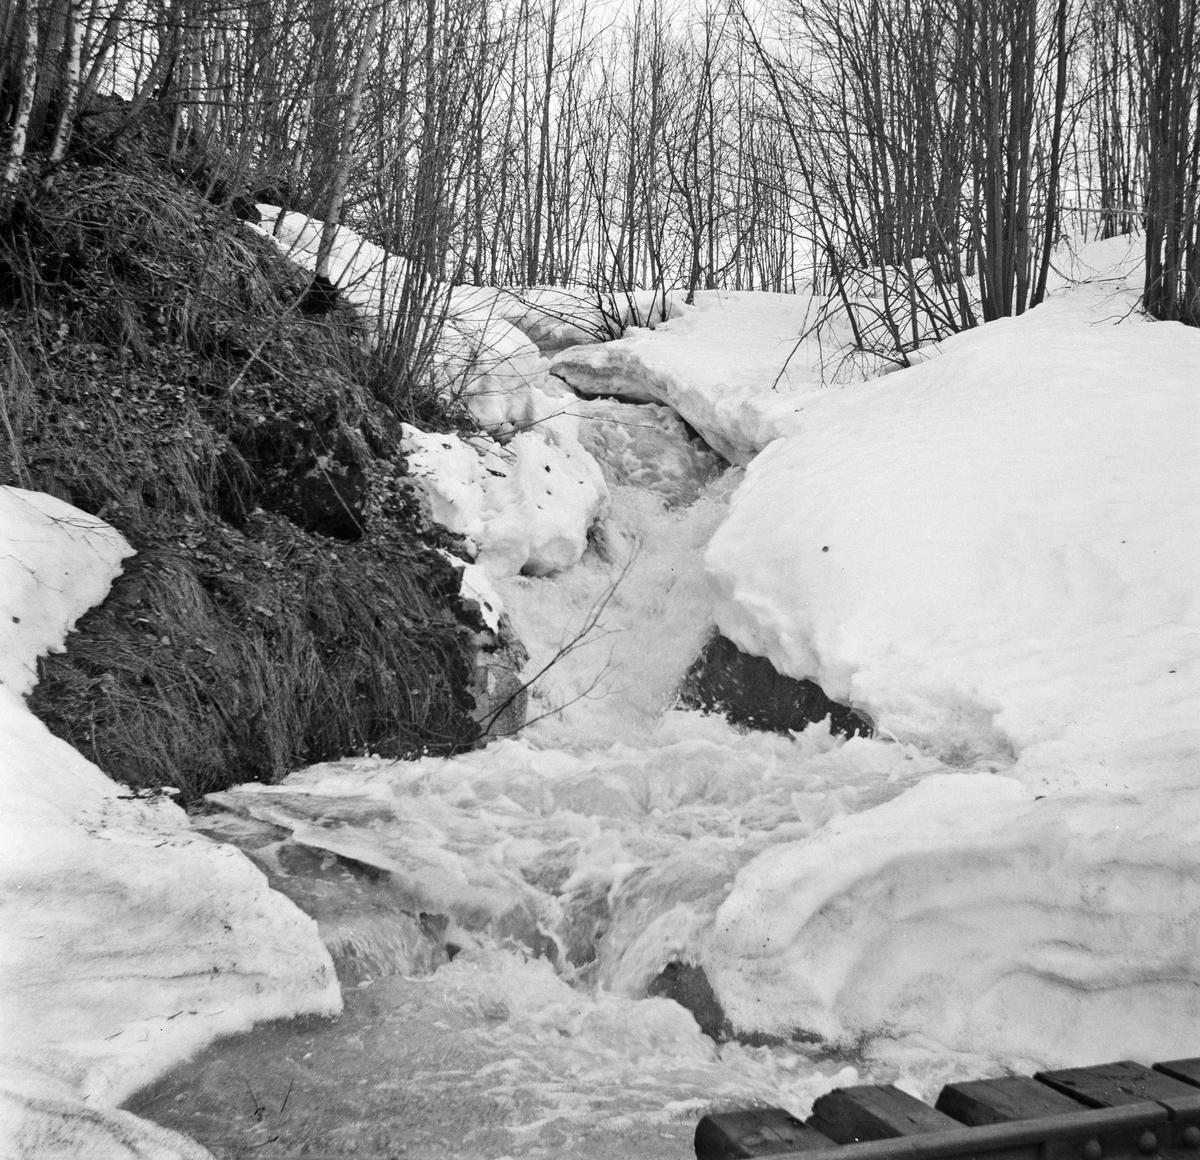 Stor vannføring i Småfoss, som render i kulvert under Urskog-Hølandsbanens trase.